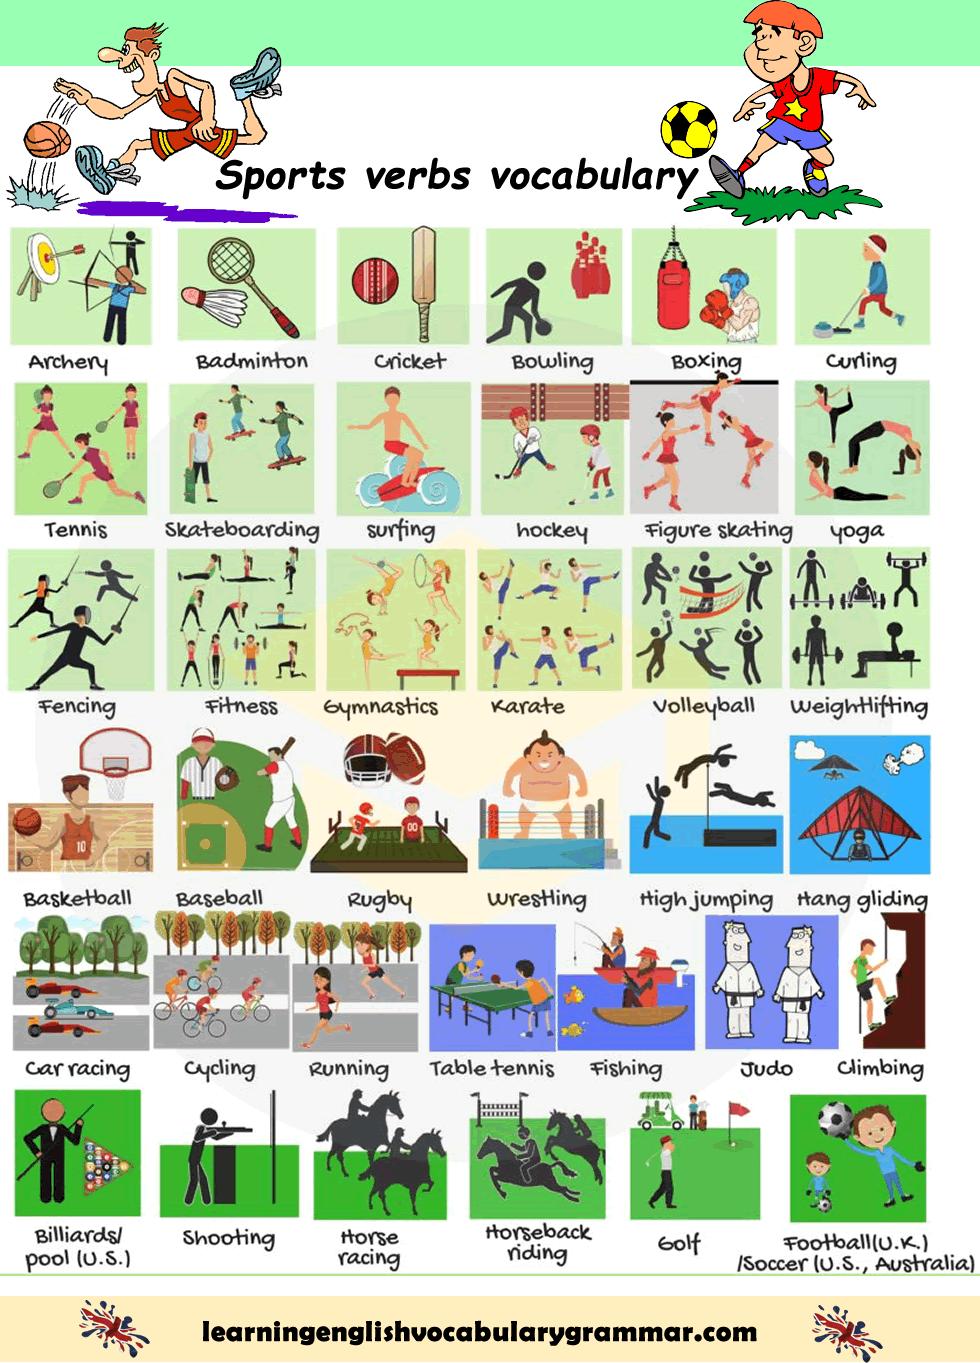 Sports Vocabulary List With Pictures And English Words Pdf Vocabulario En Ingles Inglés Para Niños Idioma Ingles